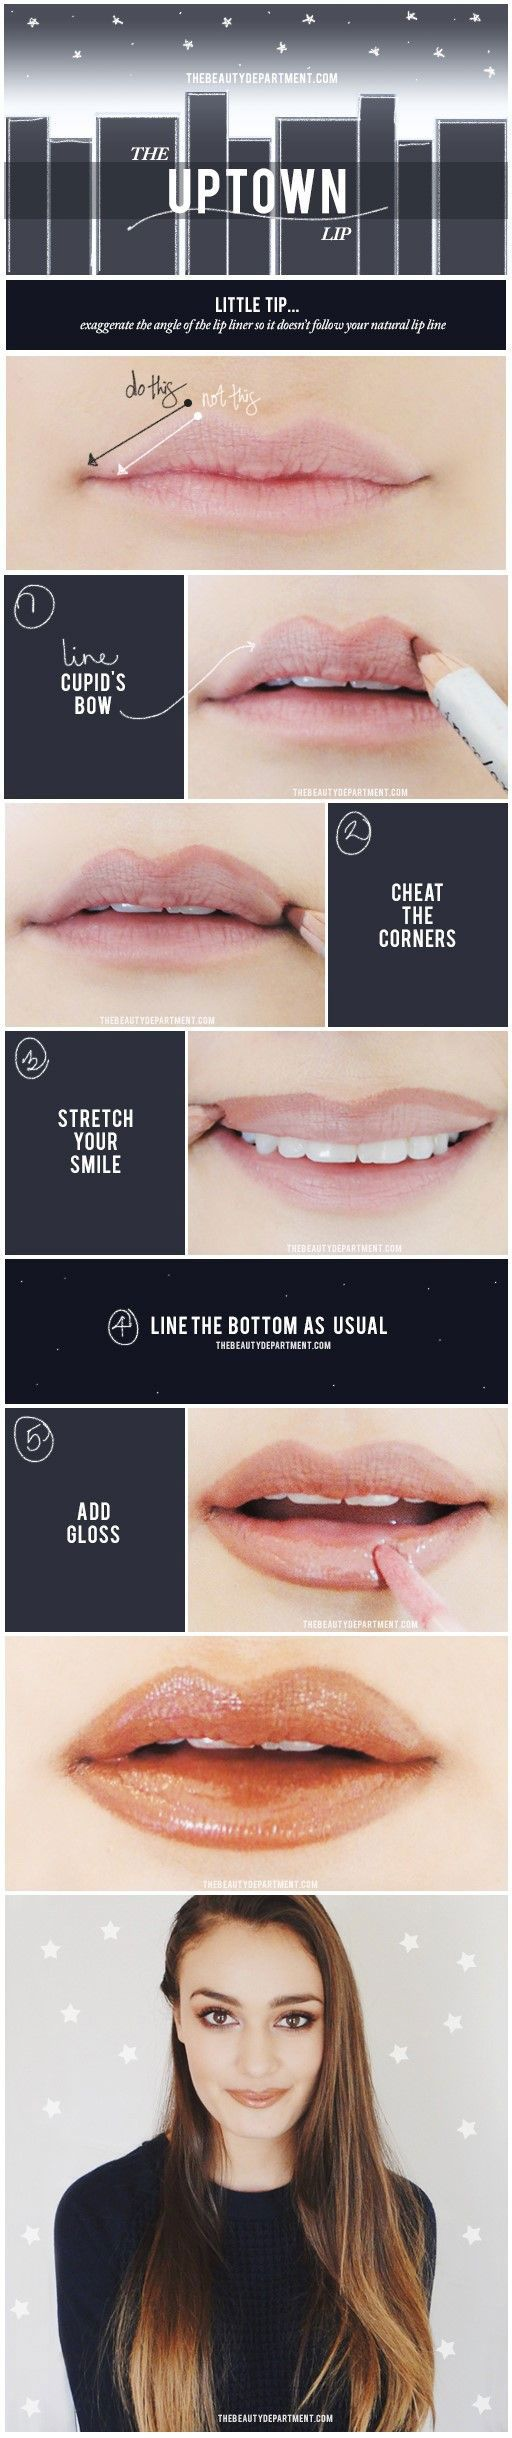 how to get bigger fuller lips